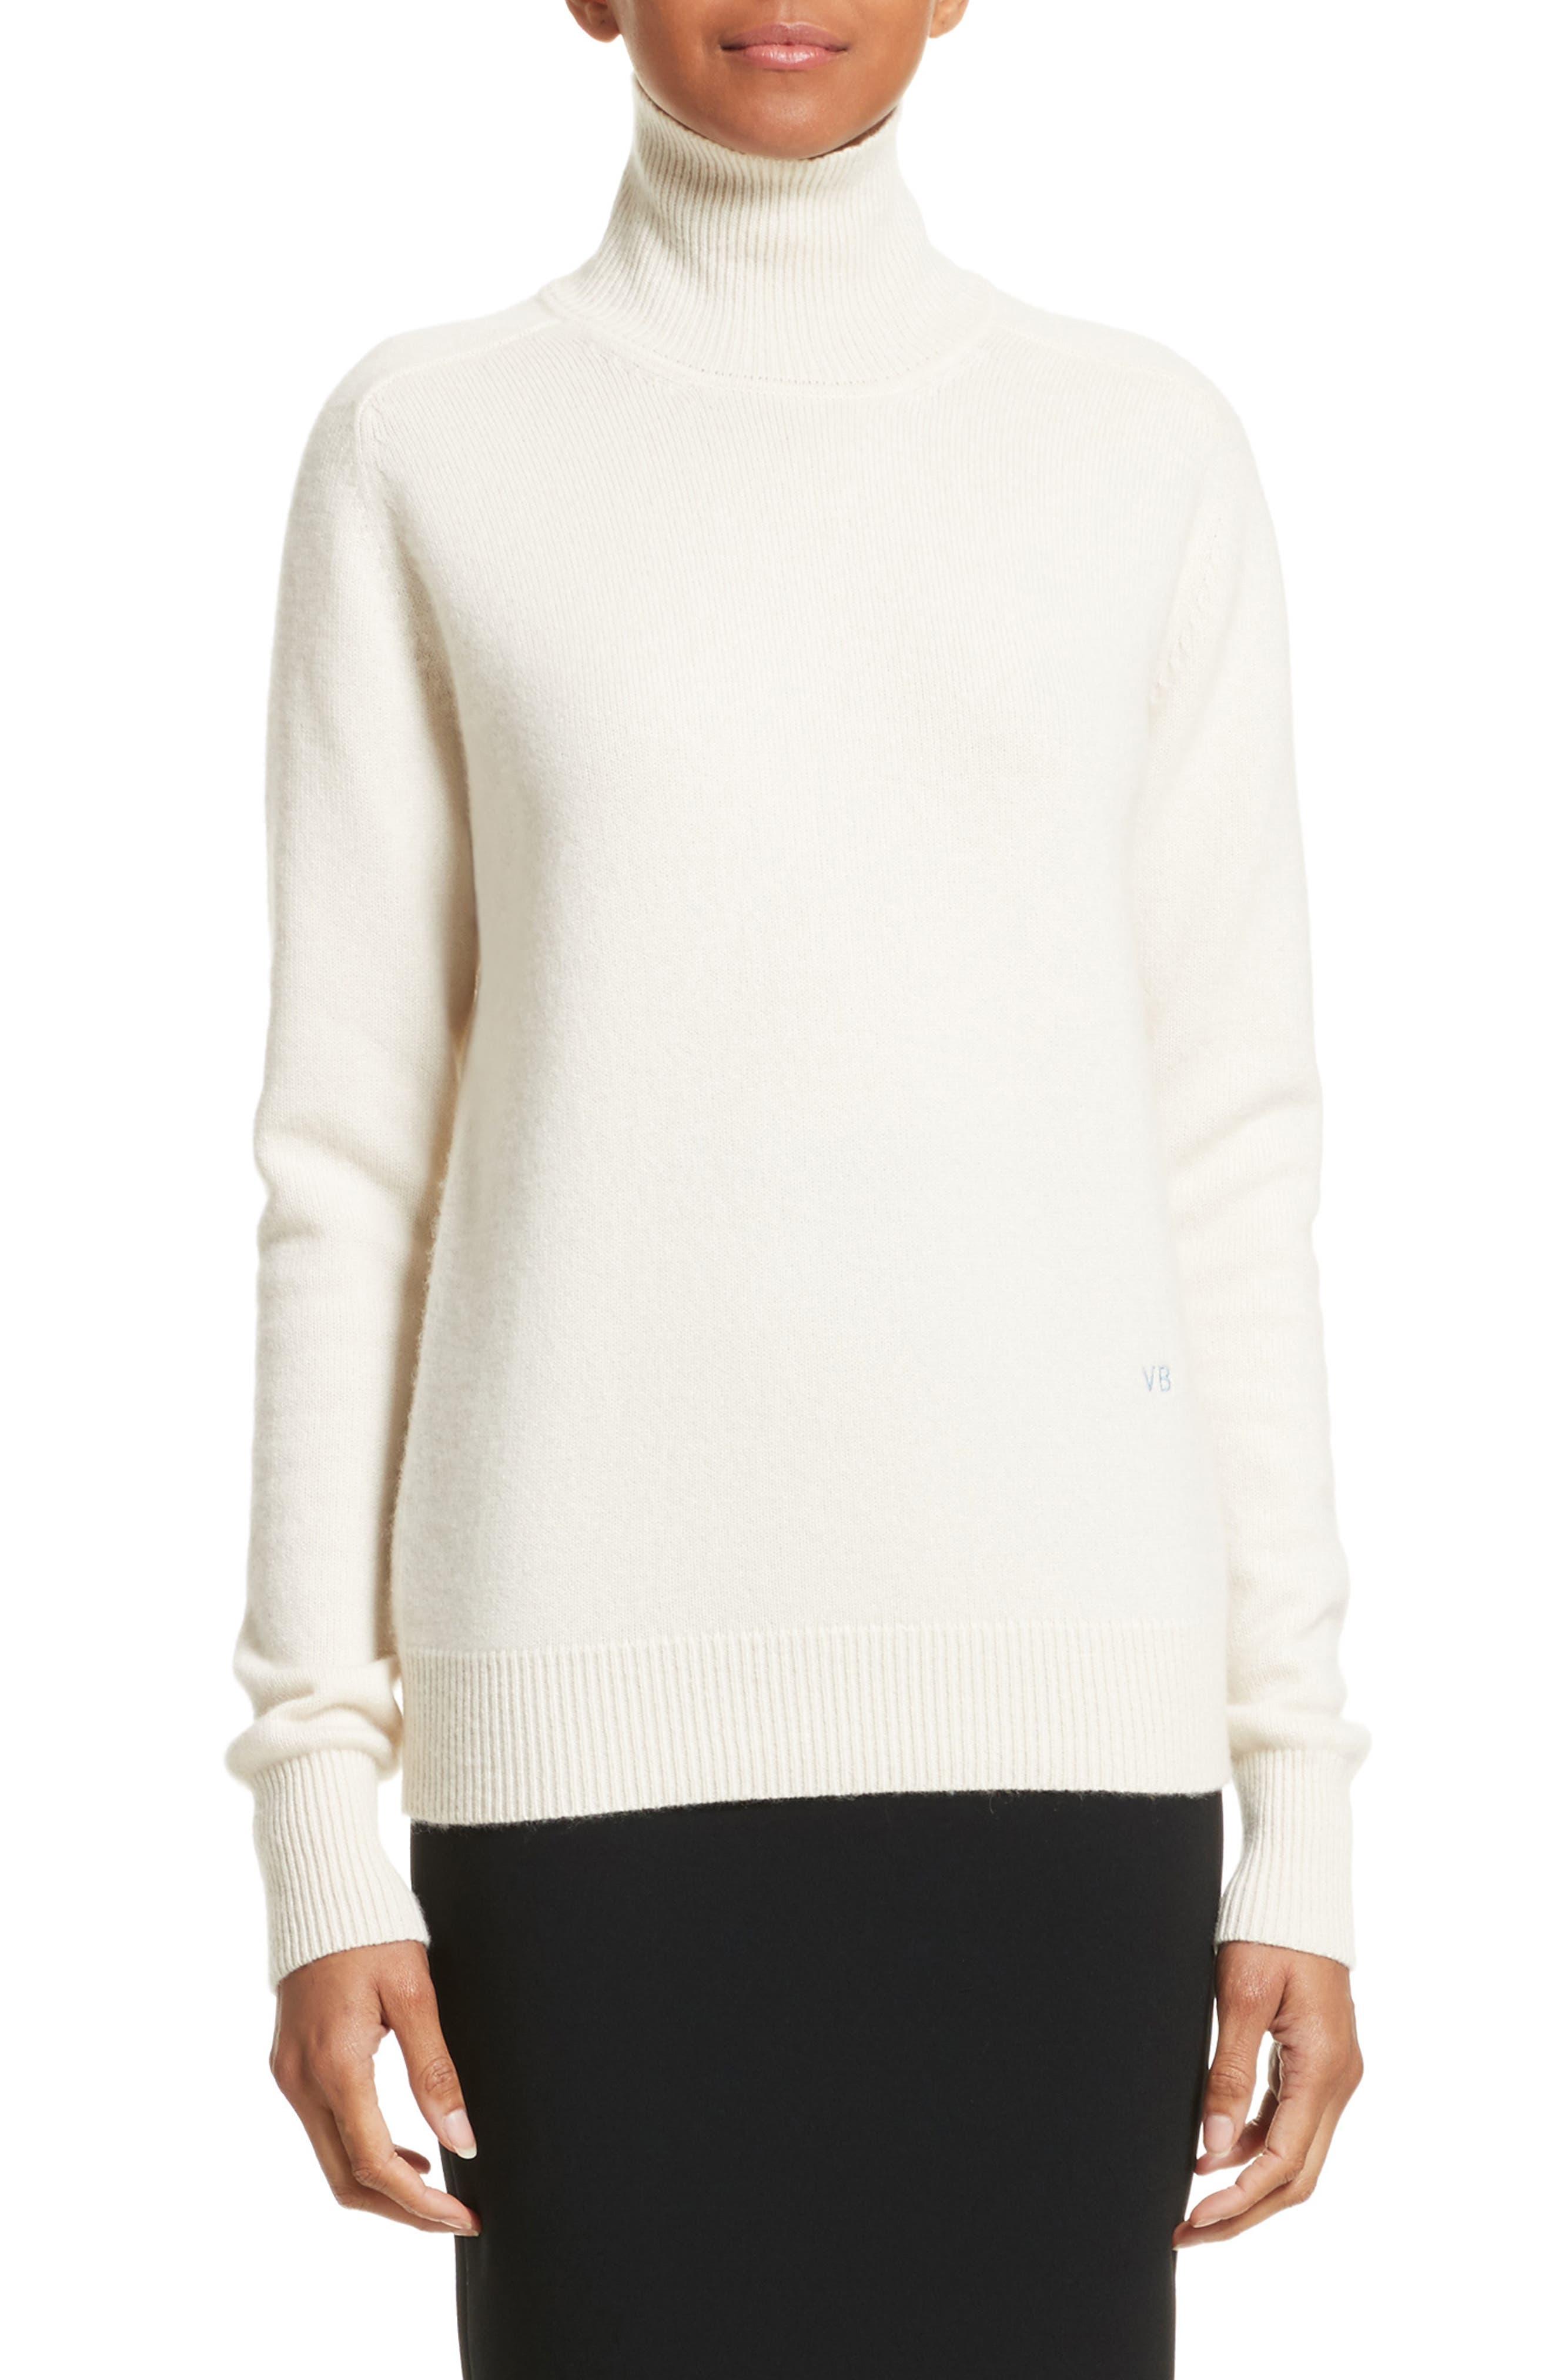 VICTORIA BECKHAM, Cashmere Turtleneck Sweater, Main thumbnail 1, color, VANILLA